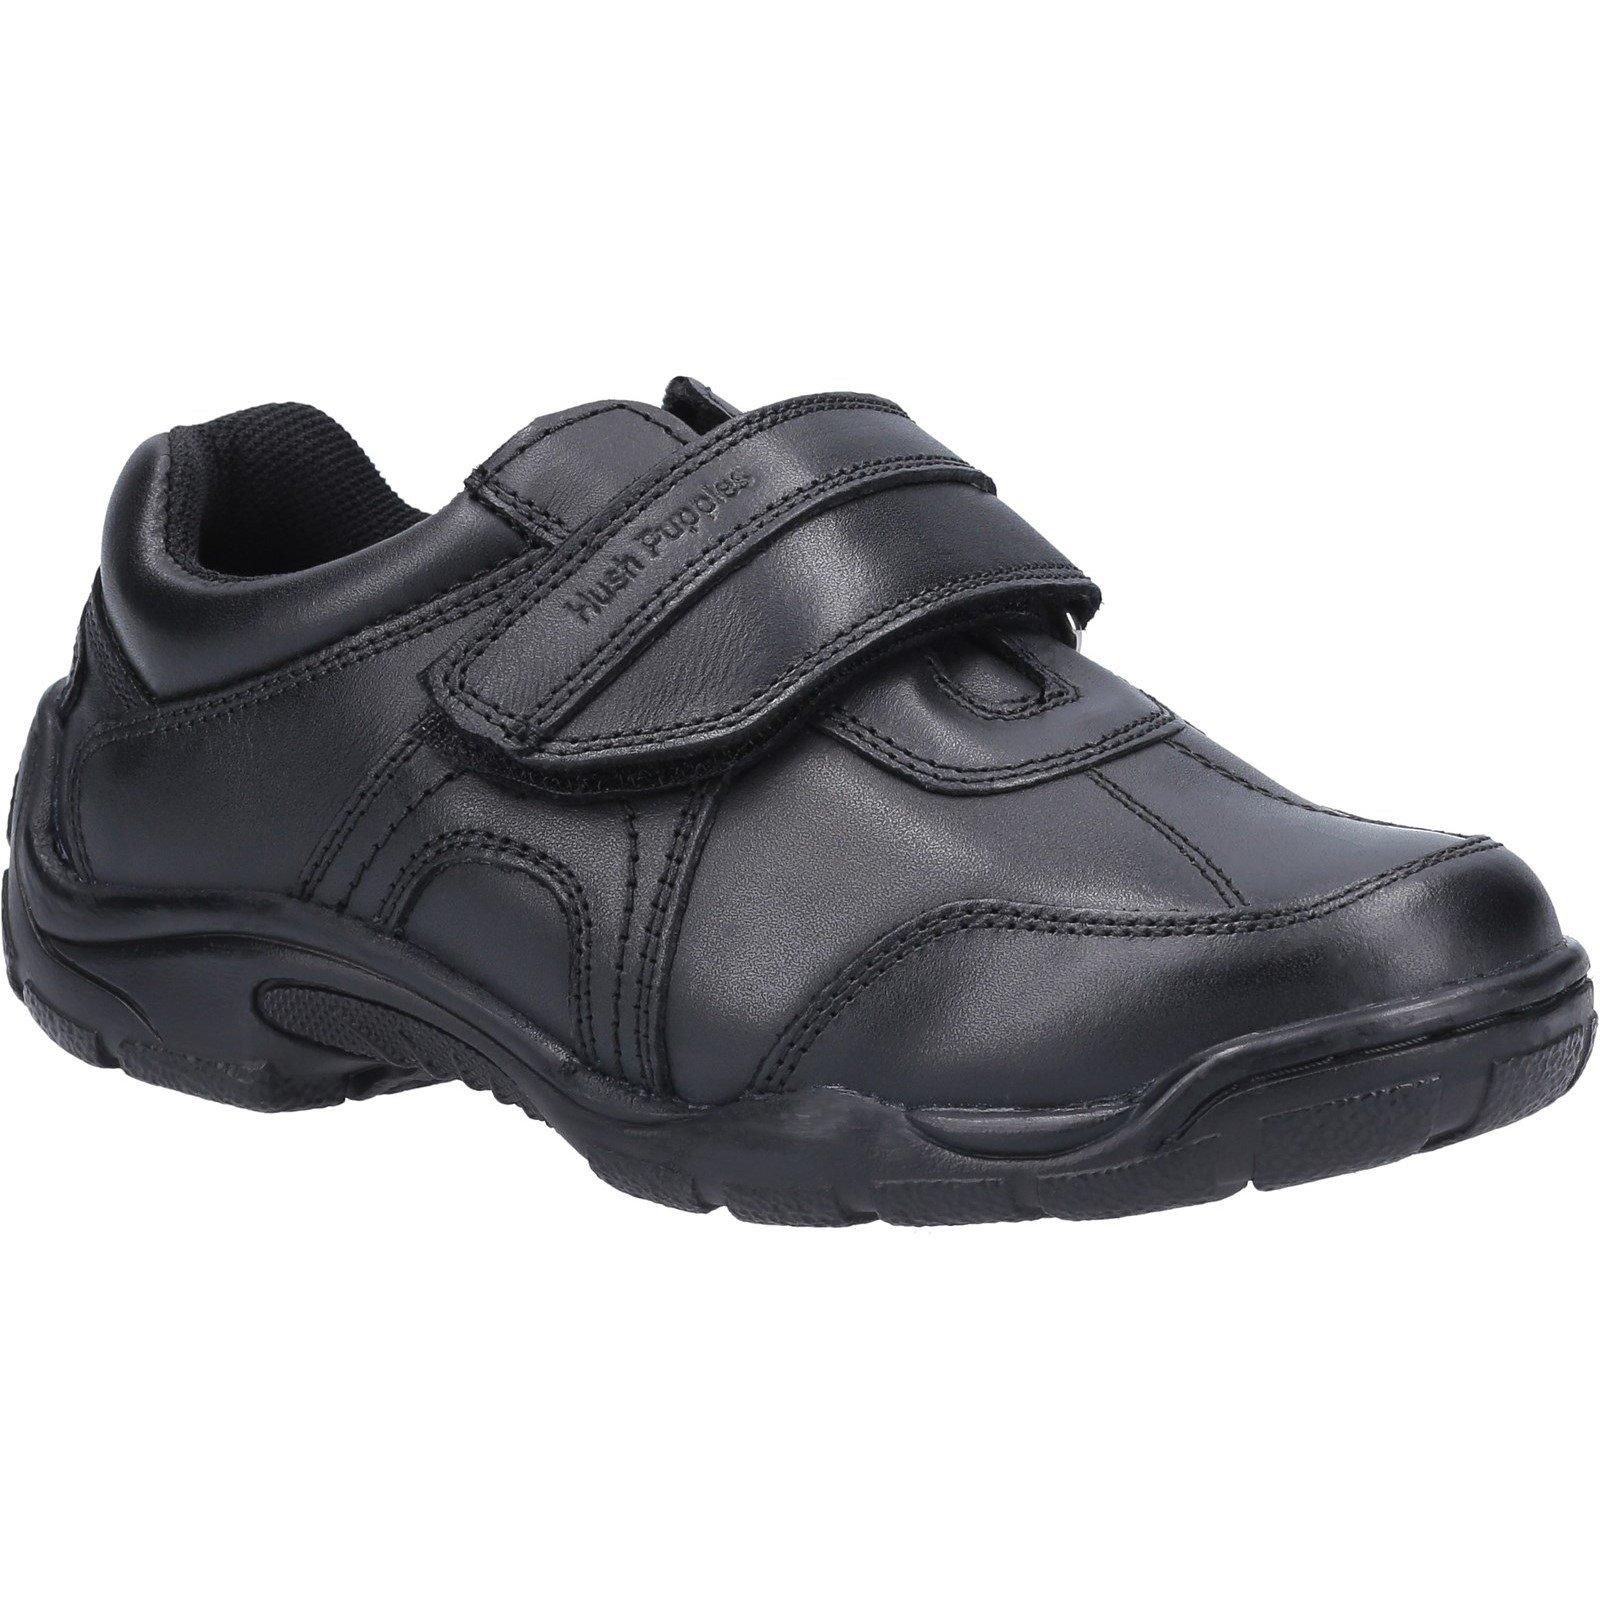 Hush Puppies Kid's Arlo Junior School Shoe Black 30853 - Black 11.5